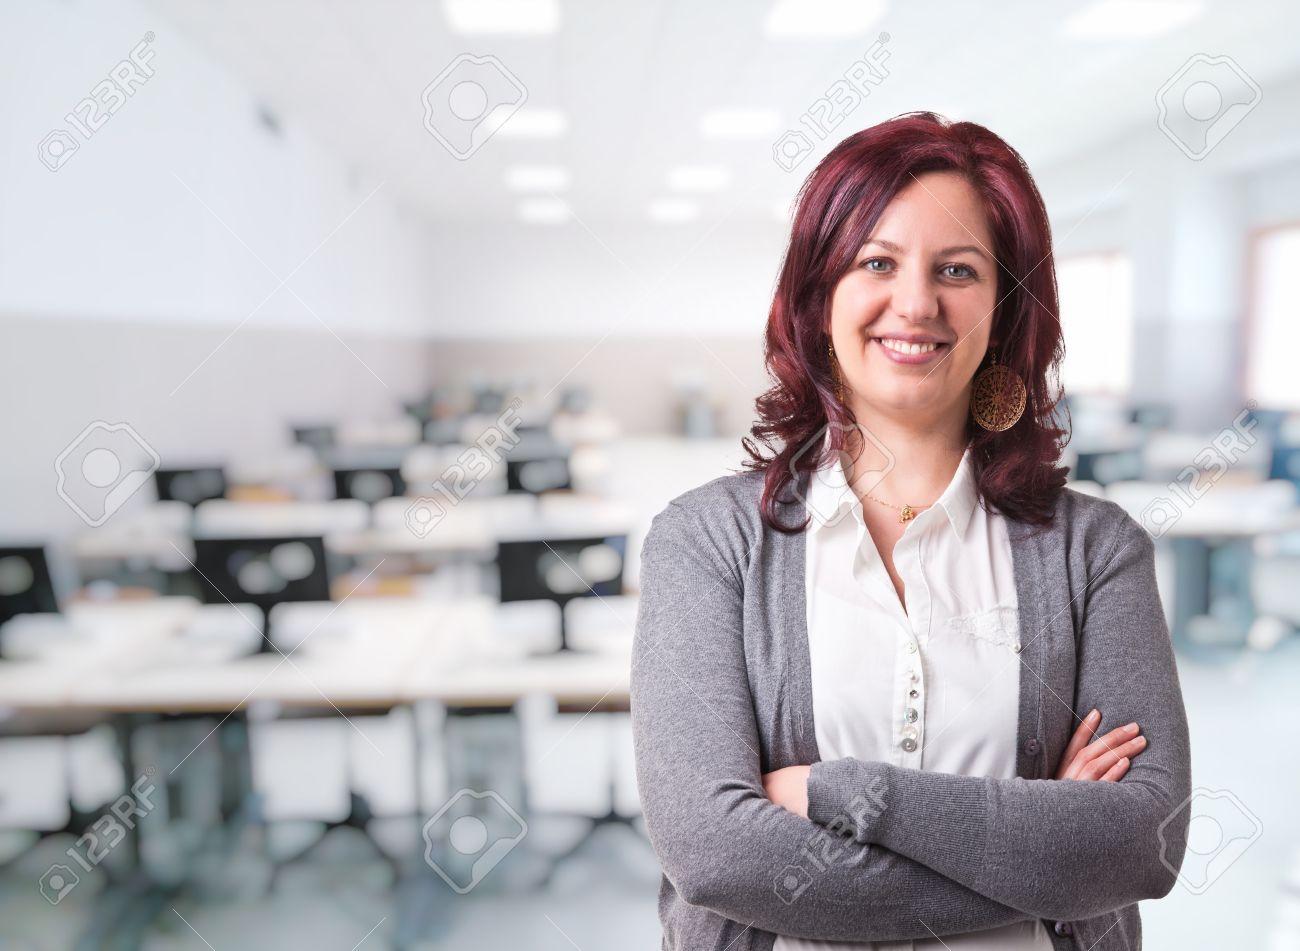 woman teacher portrait and class background - 50430776